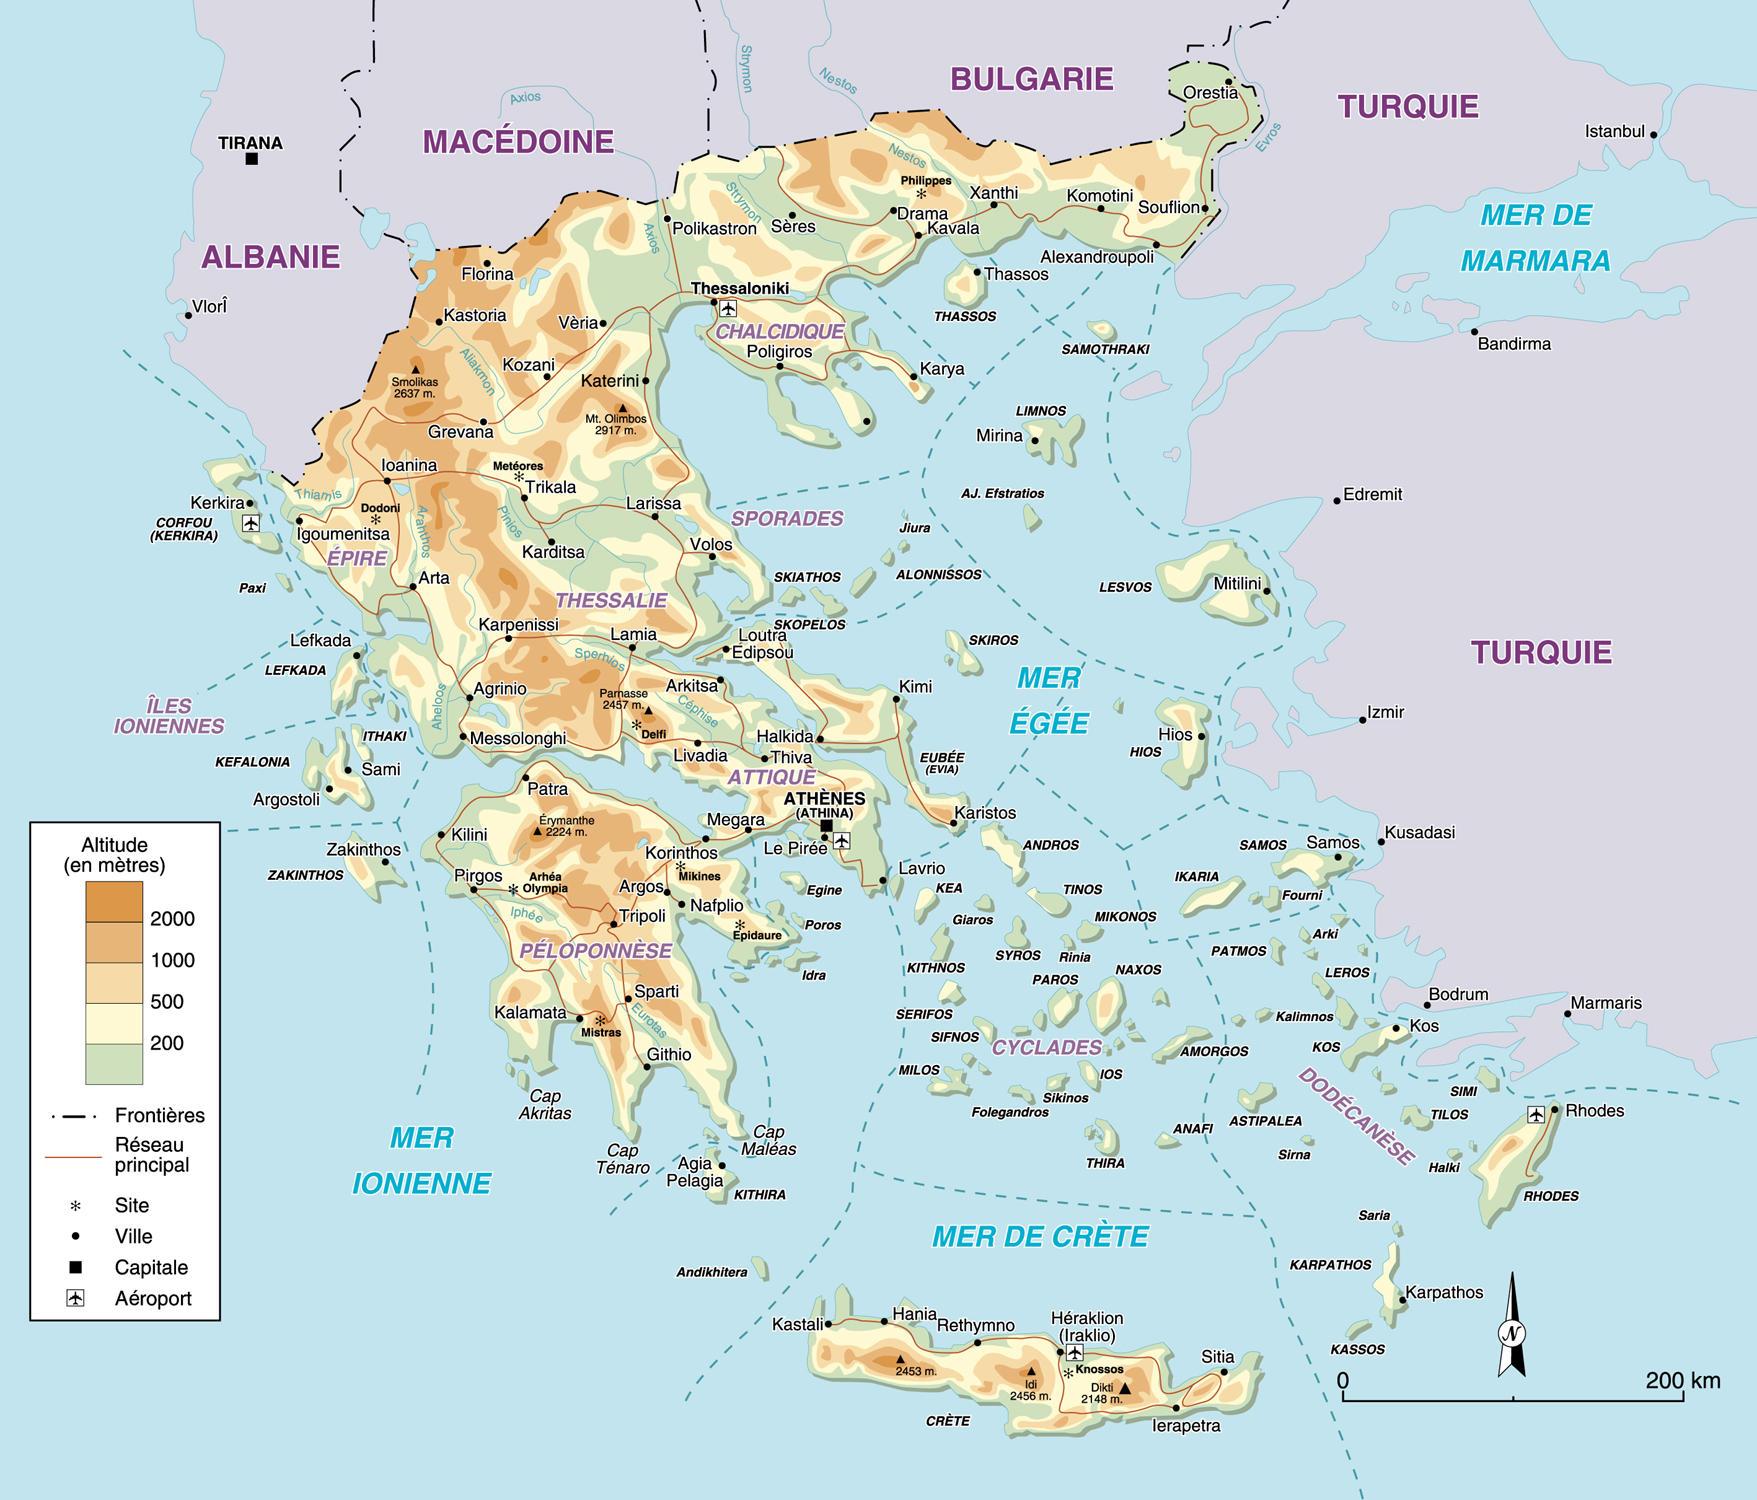 Carte des îles grecques   TERRES GRECQUES